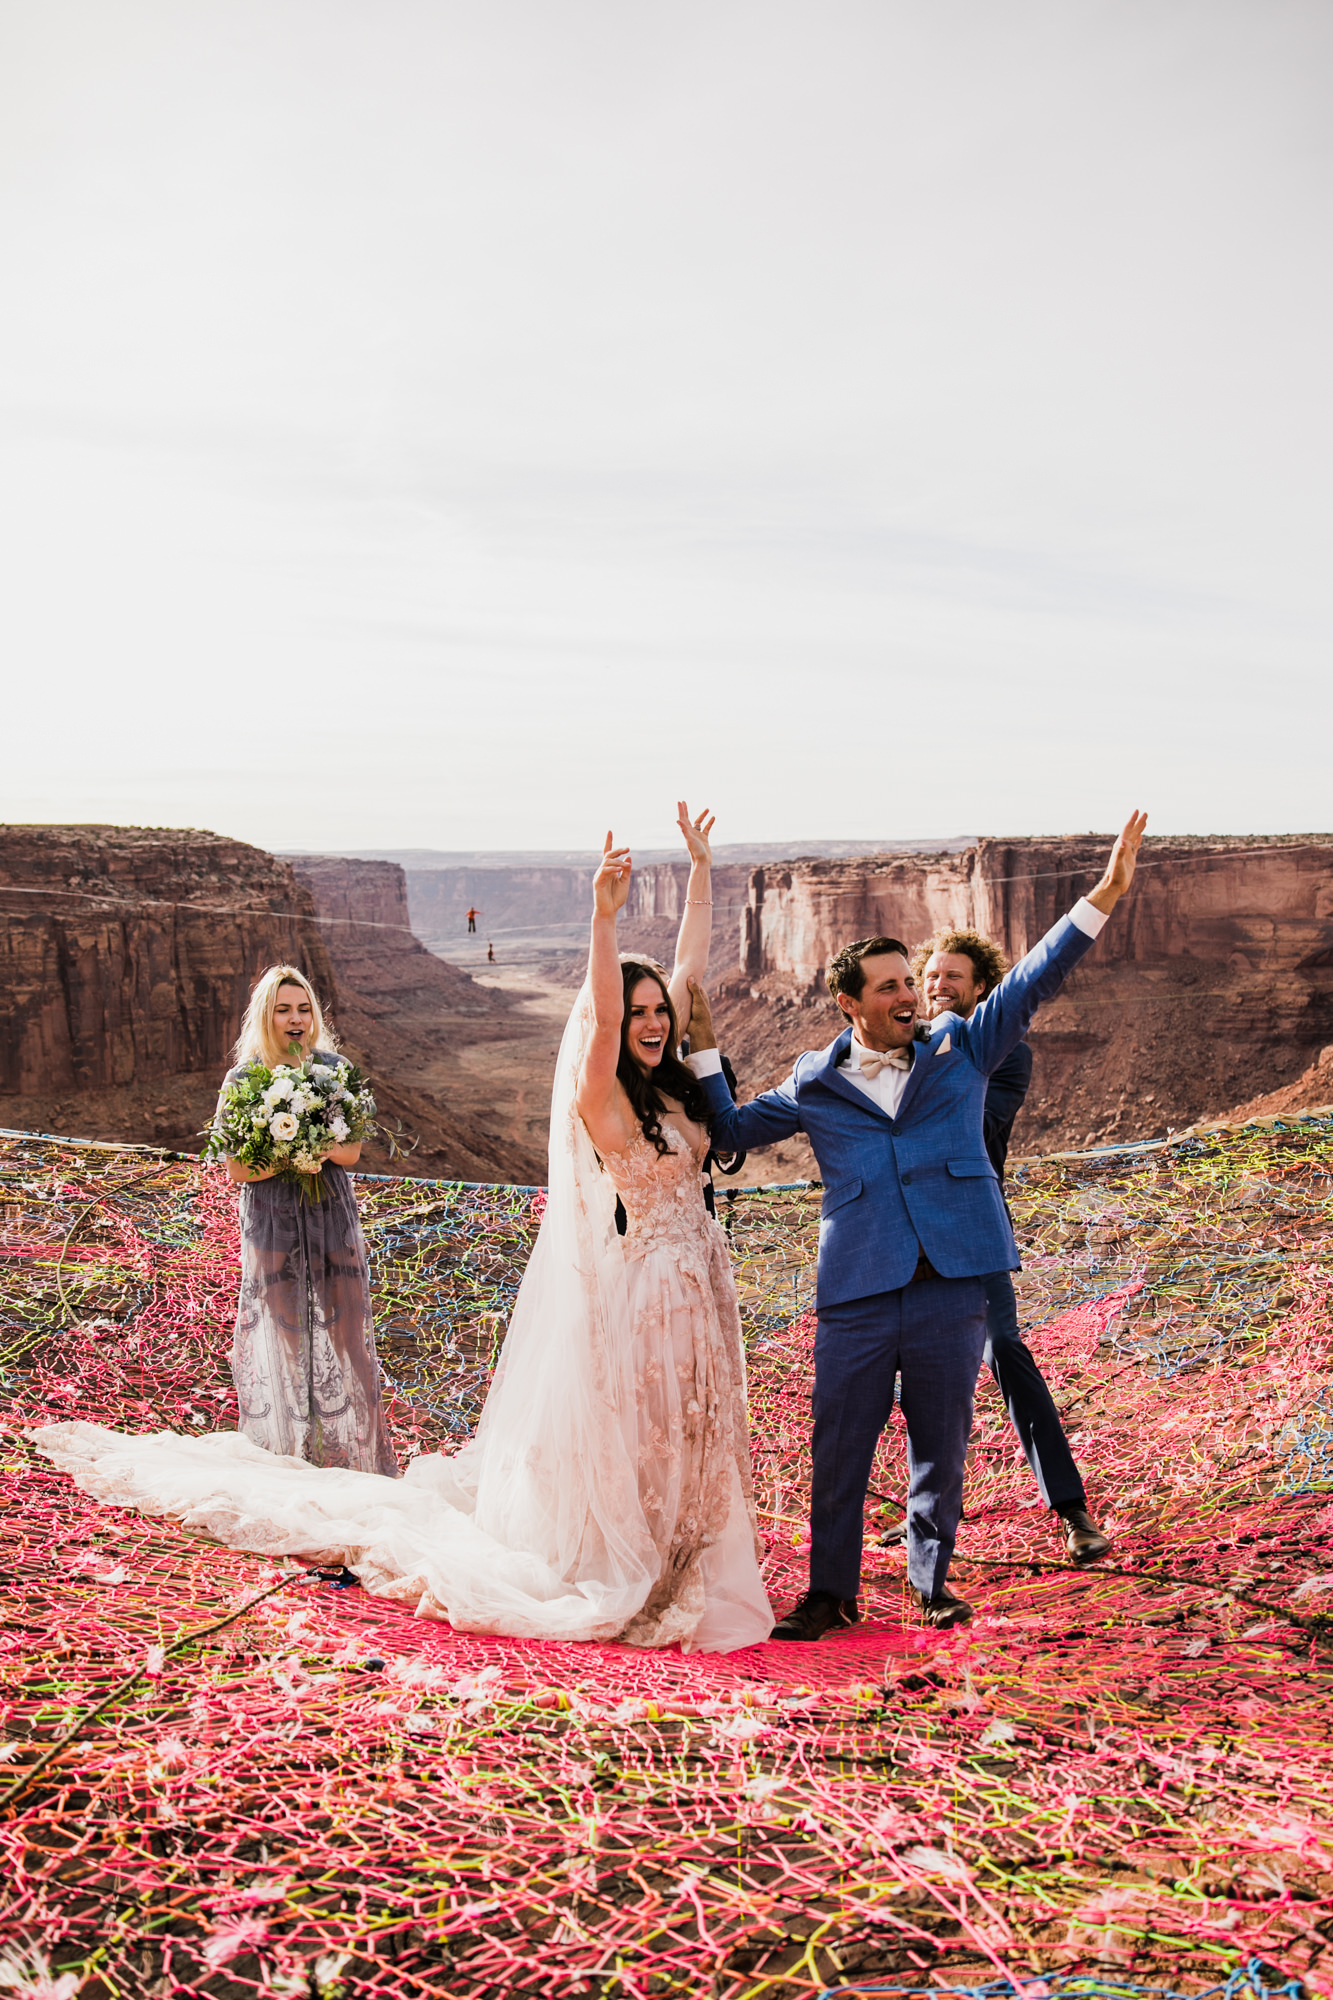 moab, utah spacenet wedding over a canyon | destination adventure wedding photographers | the hearnes adventure photography | www.thehearnes.com